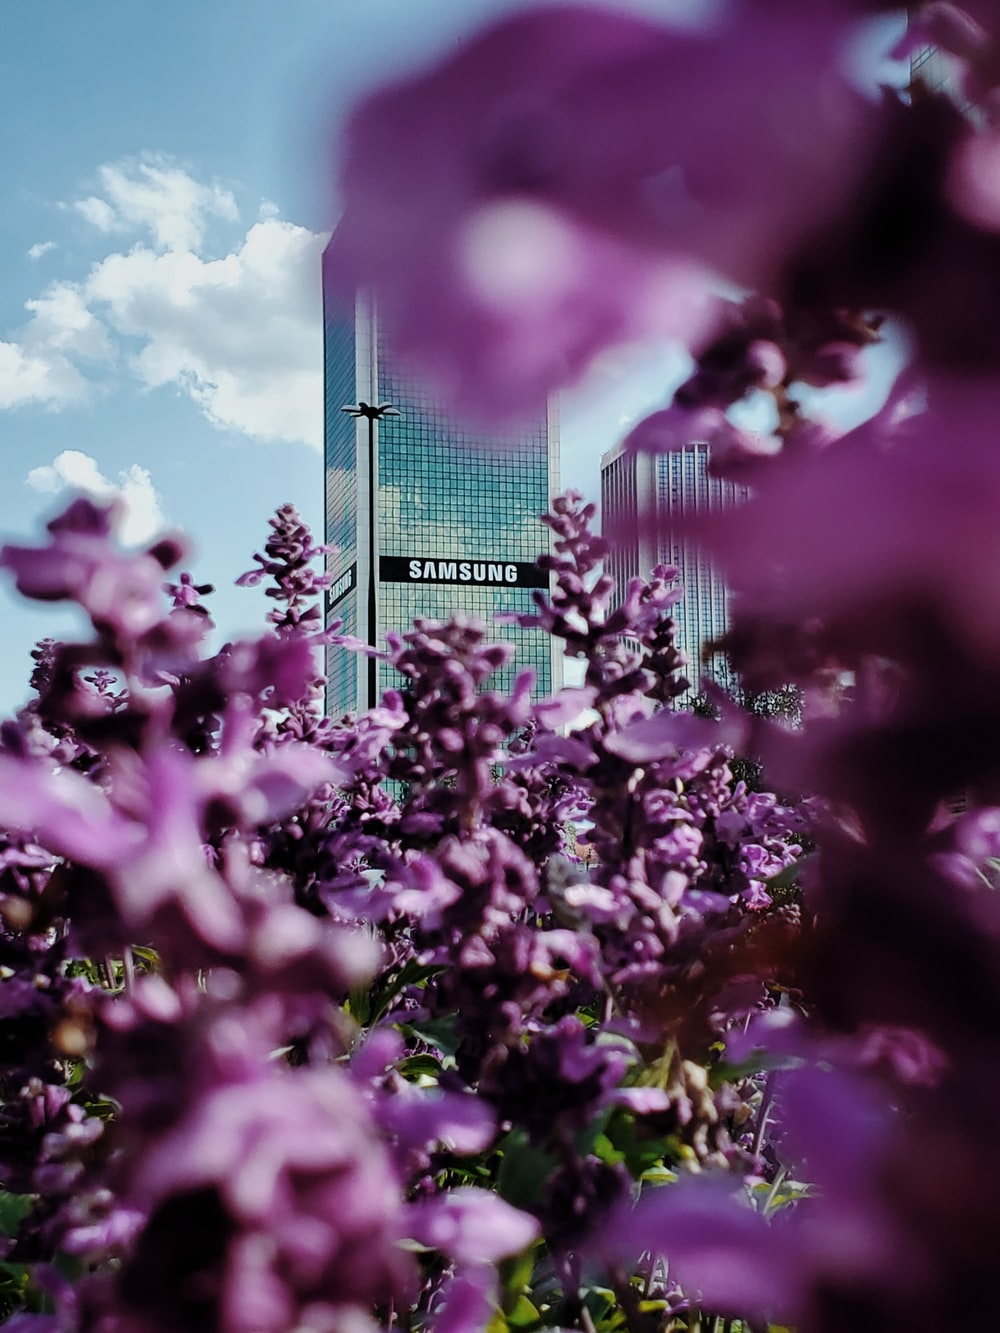 Samsung building through pink-petaled flowers